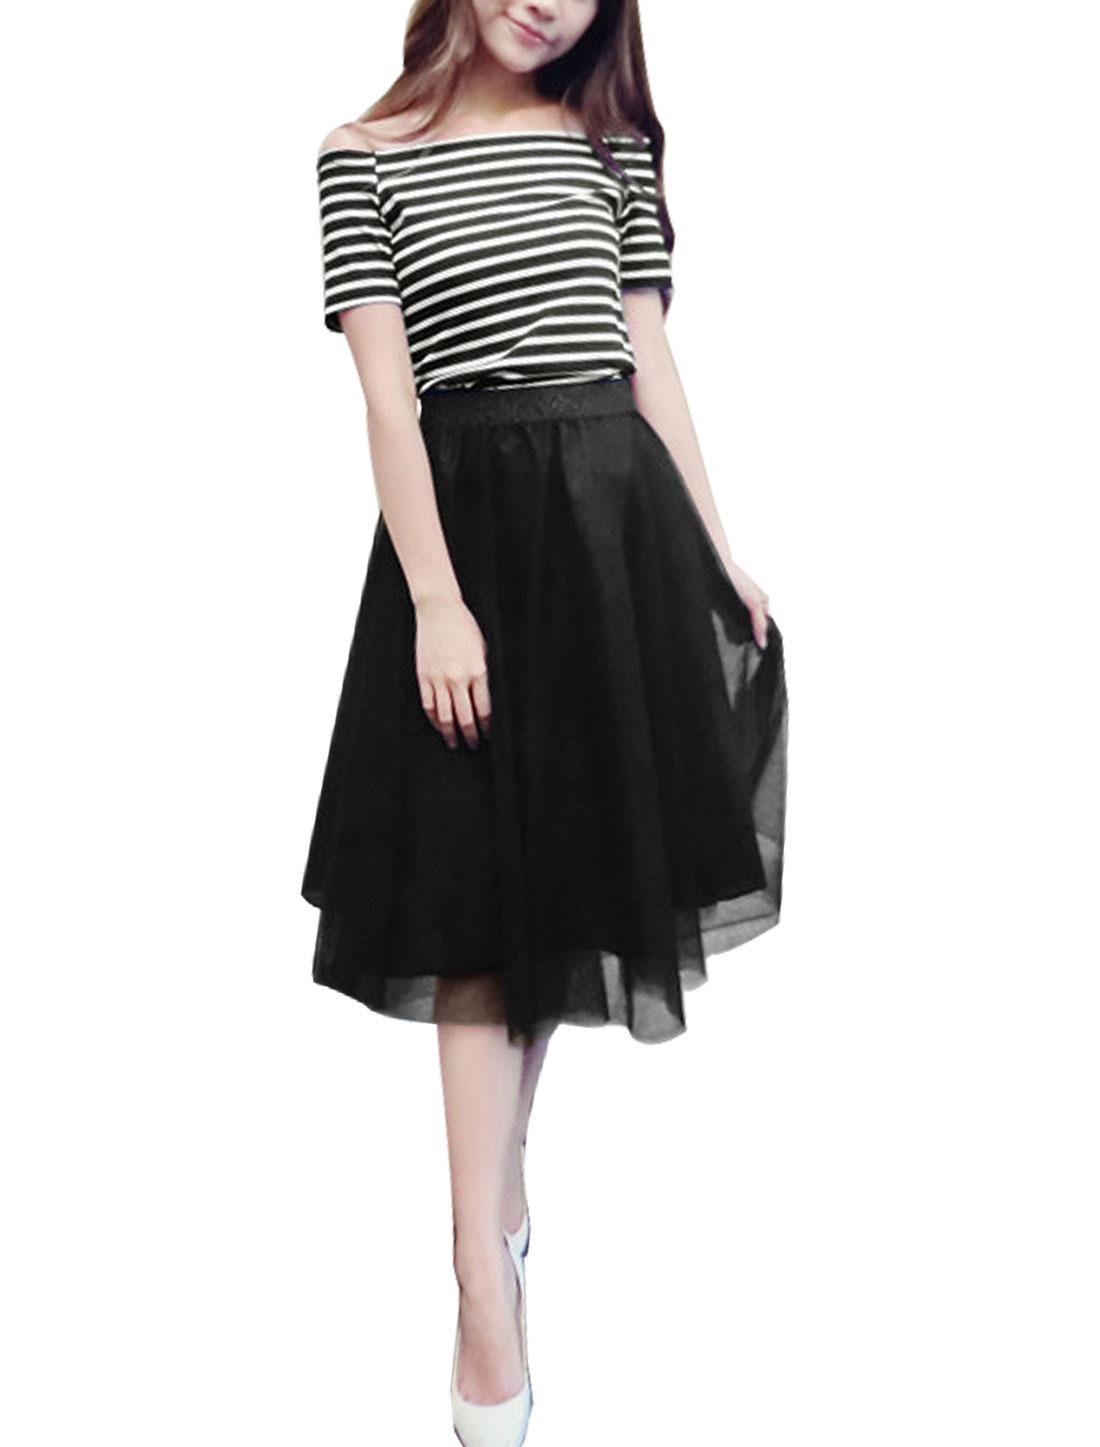 Women Stripes Off Shoulder Tops w Elatic Waist Mesh Skirts White Black S